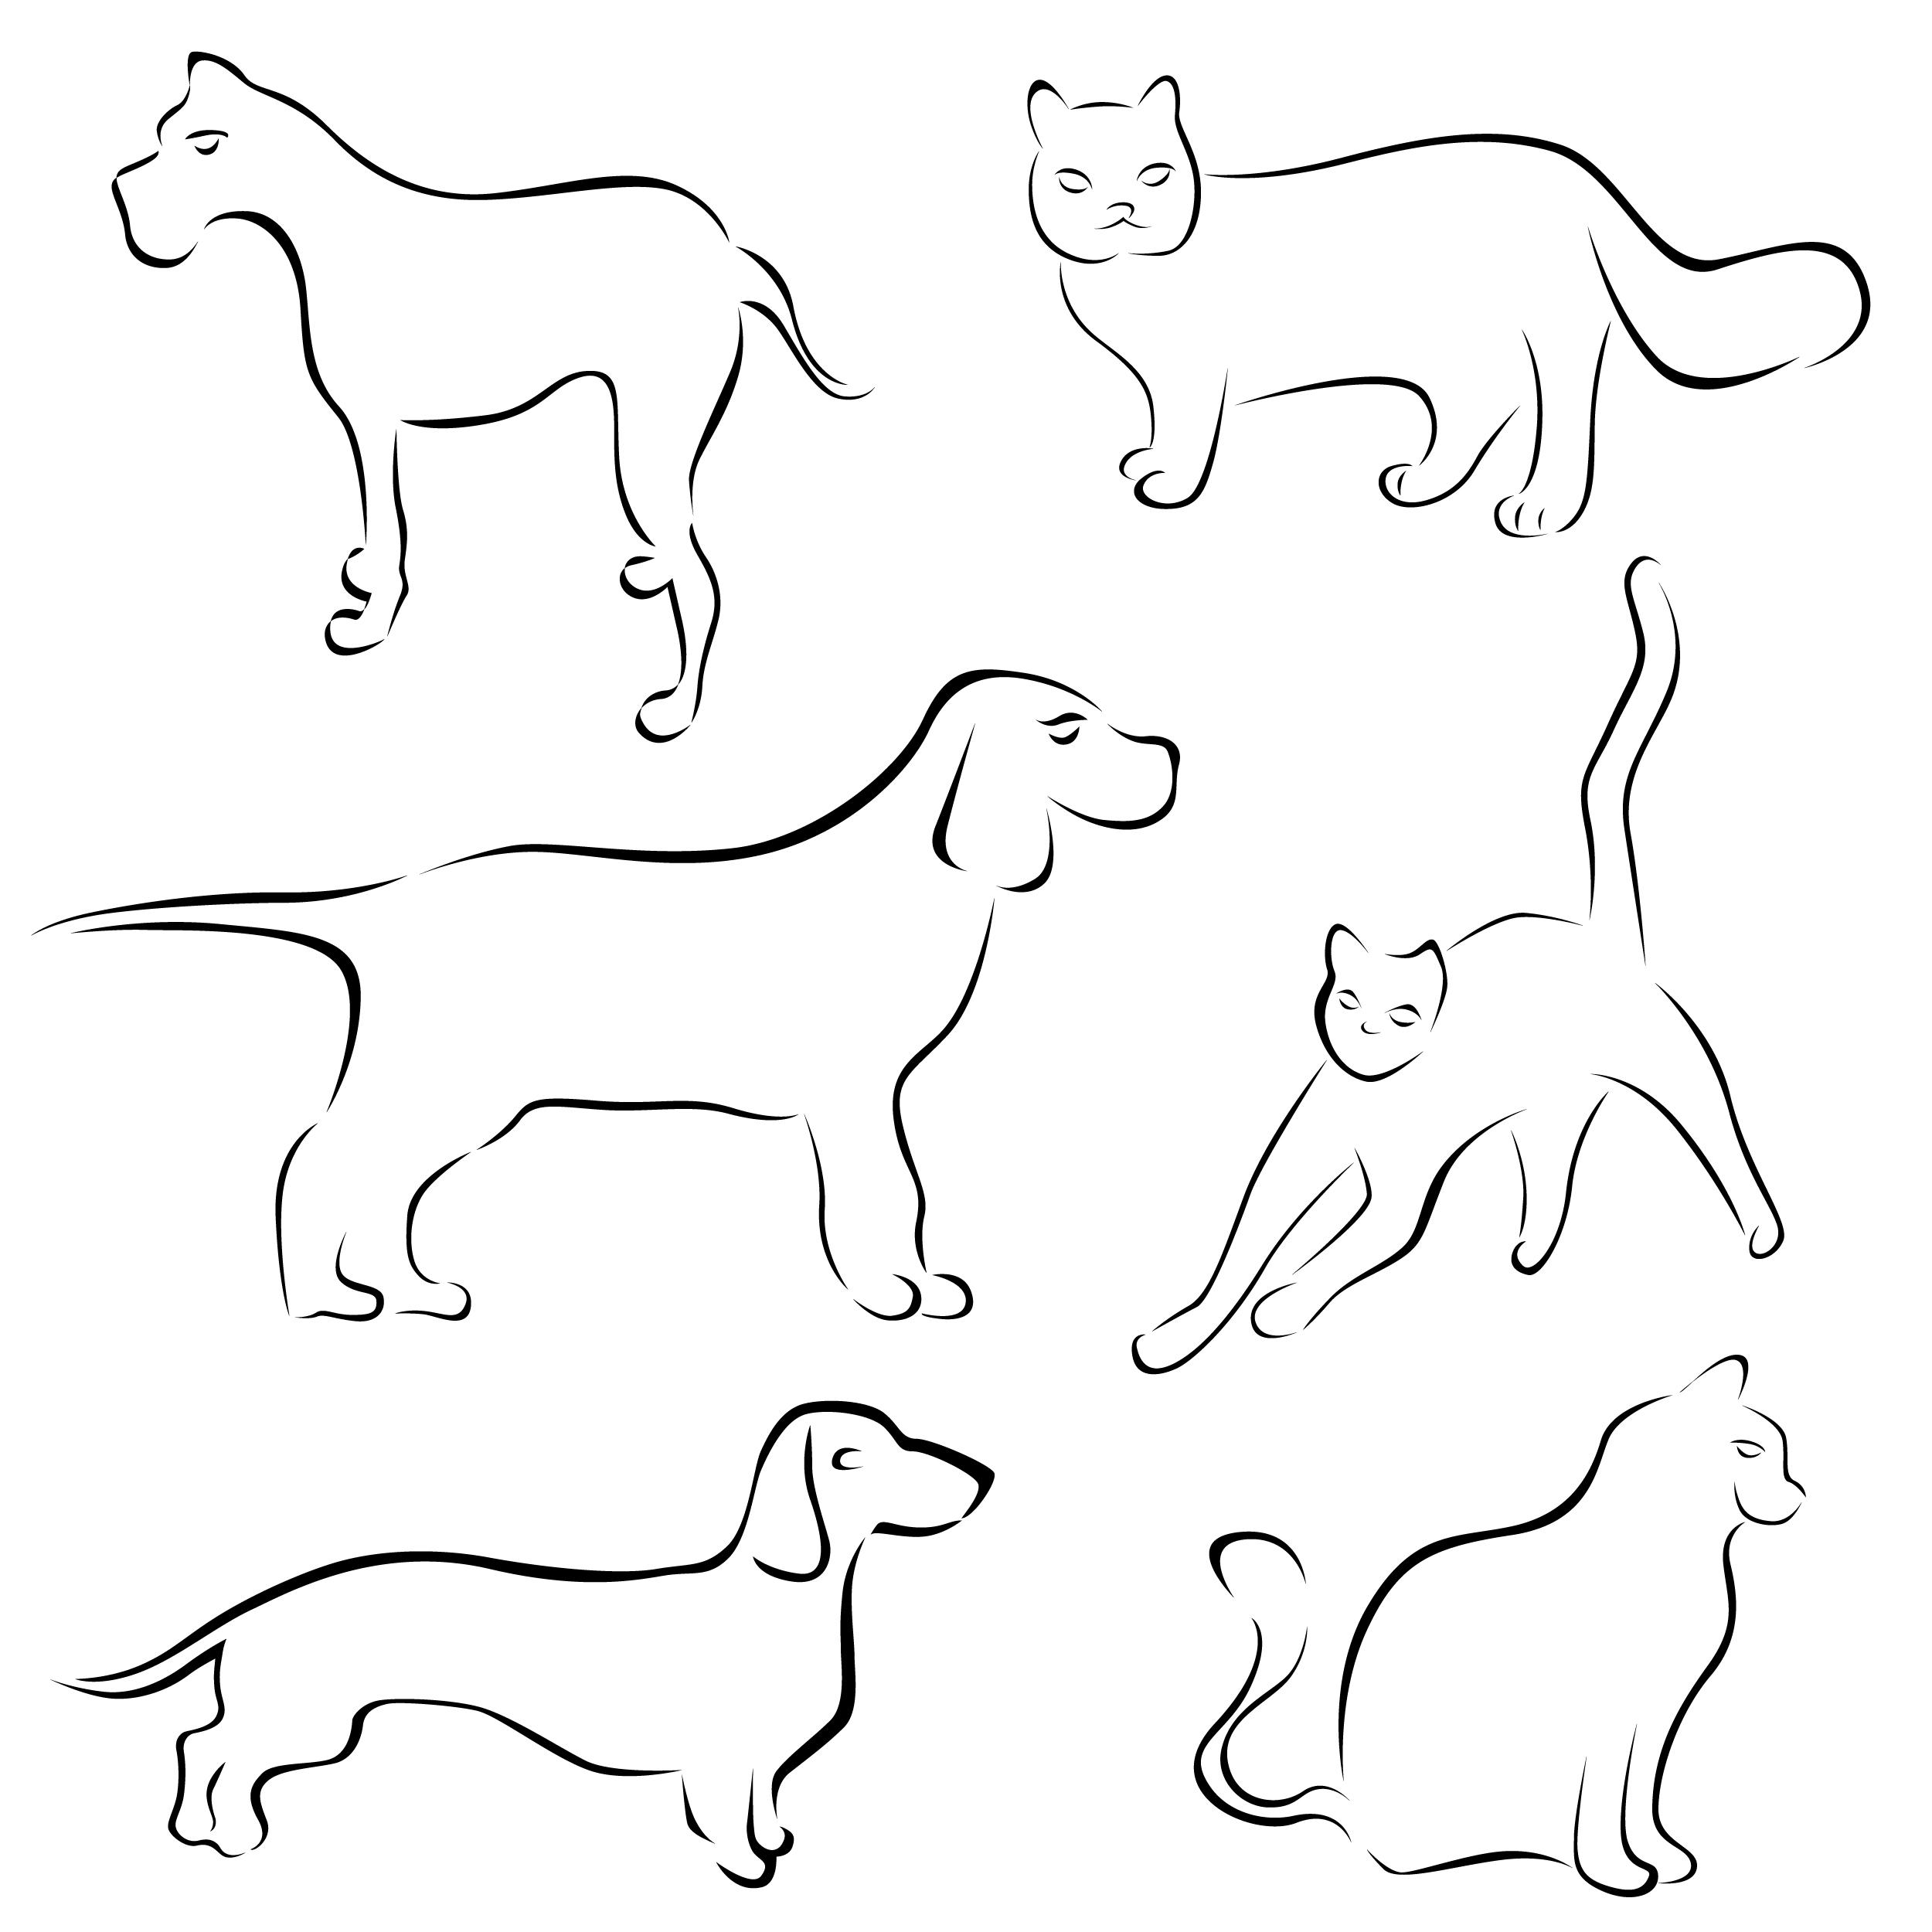 2500x2500 Stick Figure Cartoon Dog Vector Free Vector 4vector